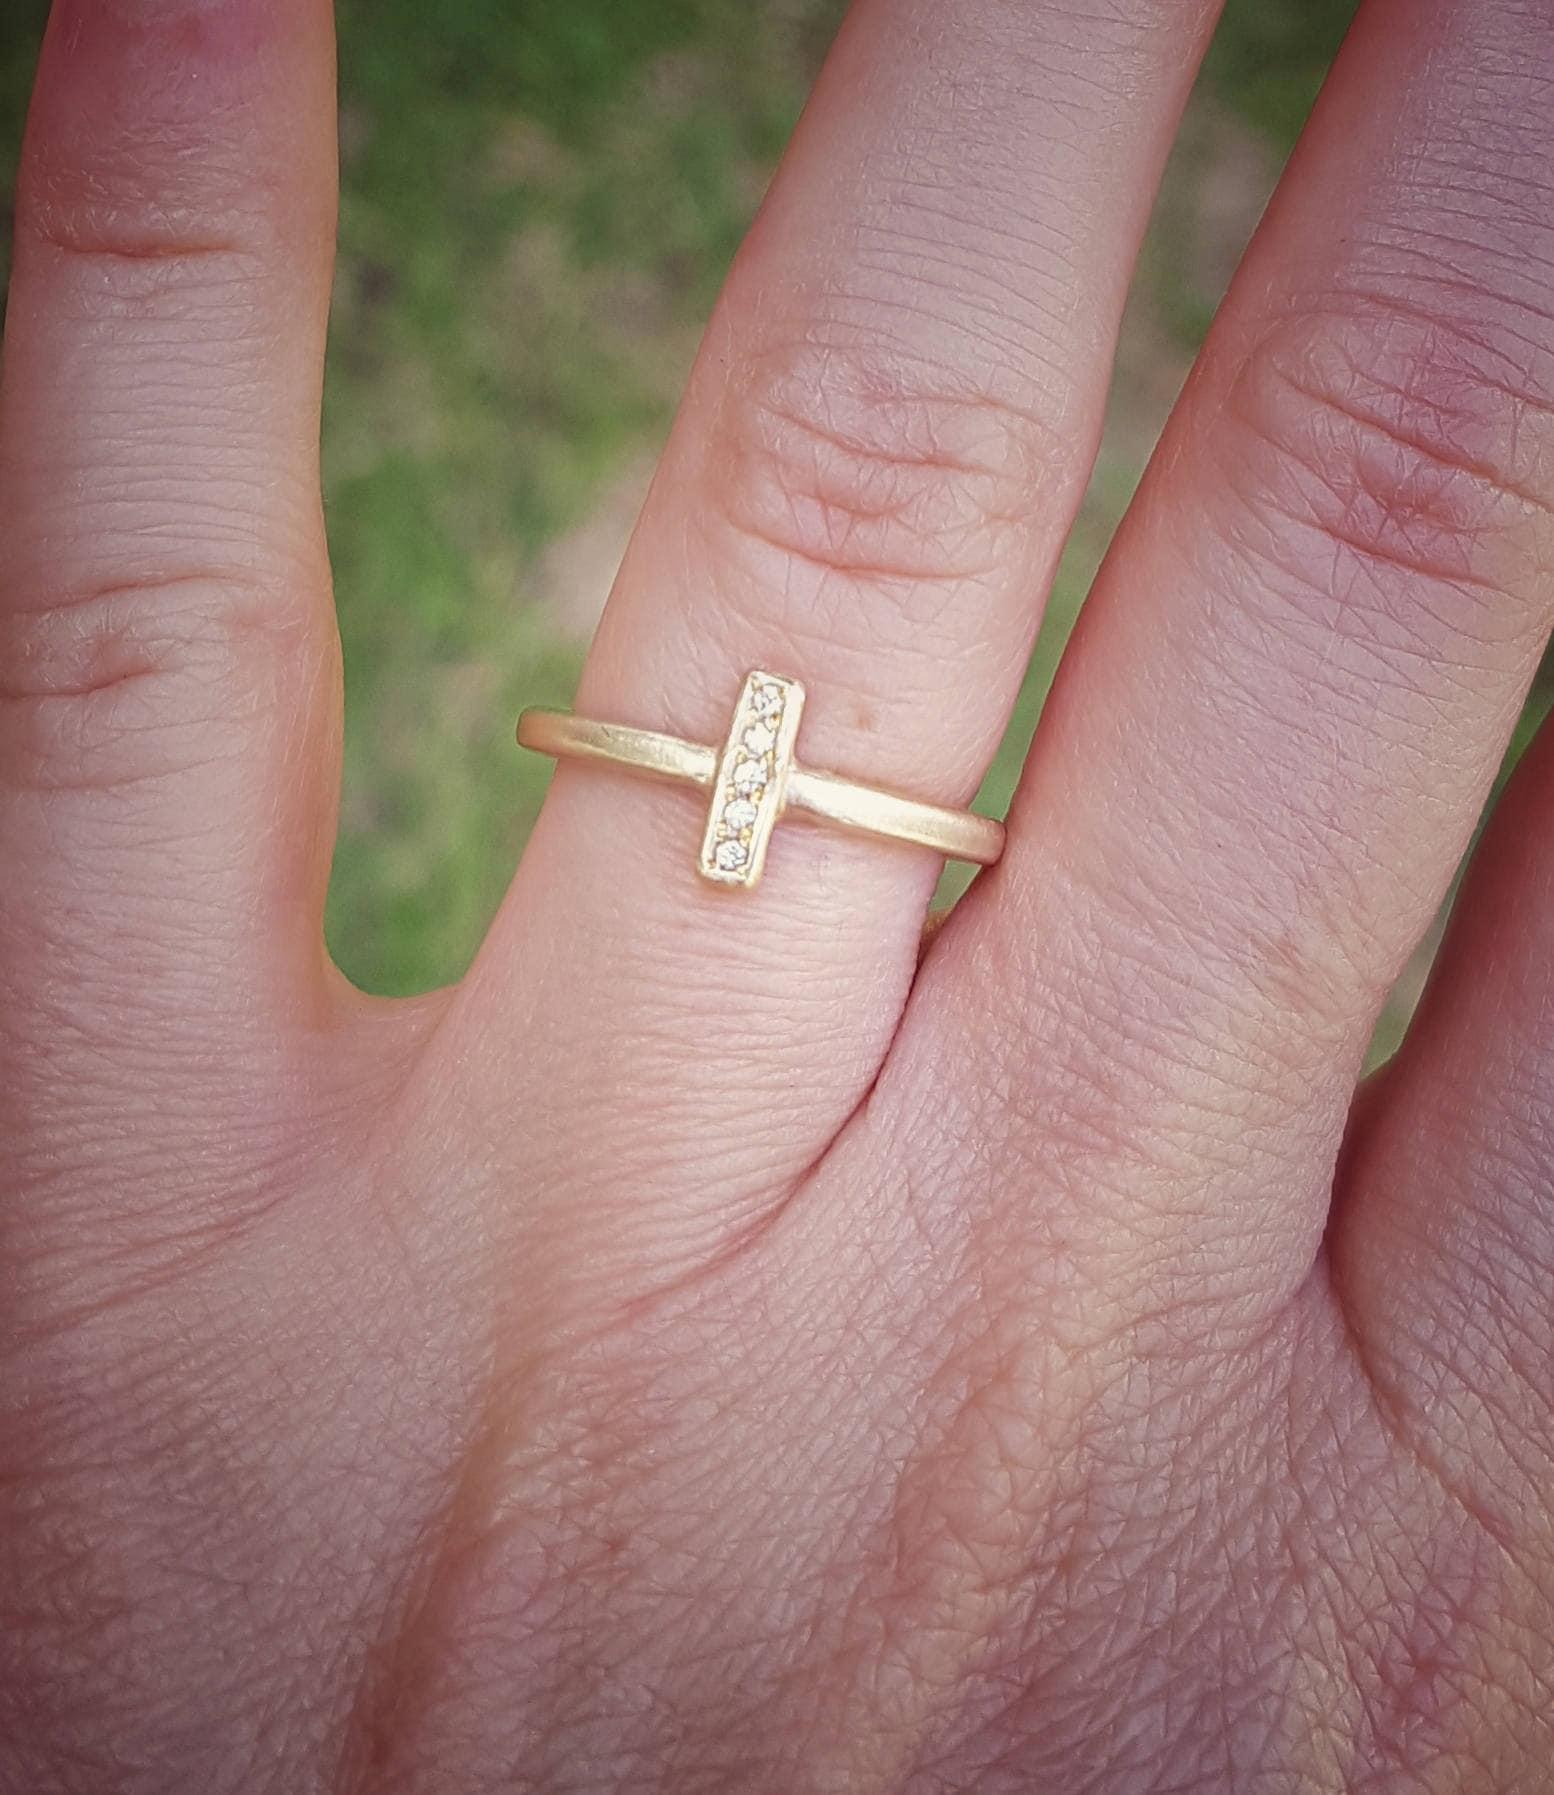 5 Diamond Ring 14K Gold Ring Diamond Engagement Ring Gold | Etsy